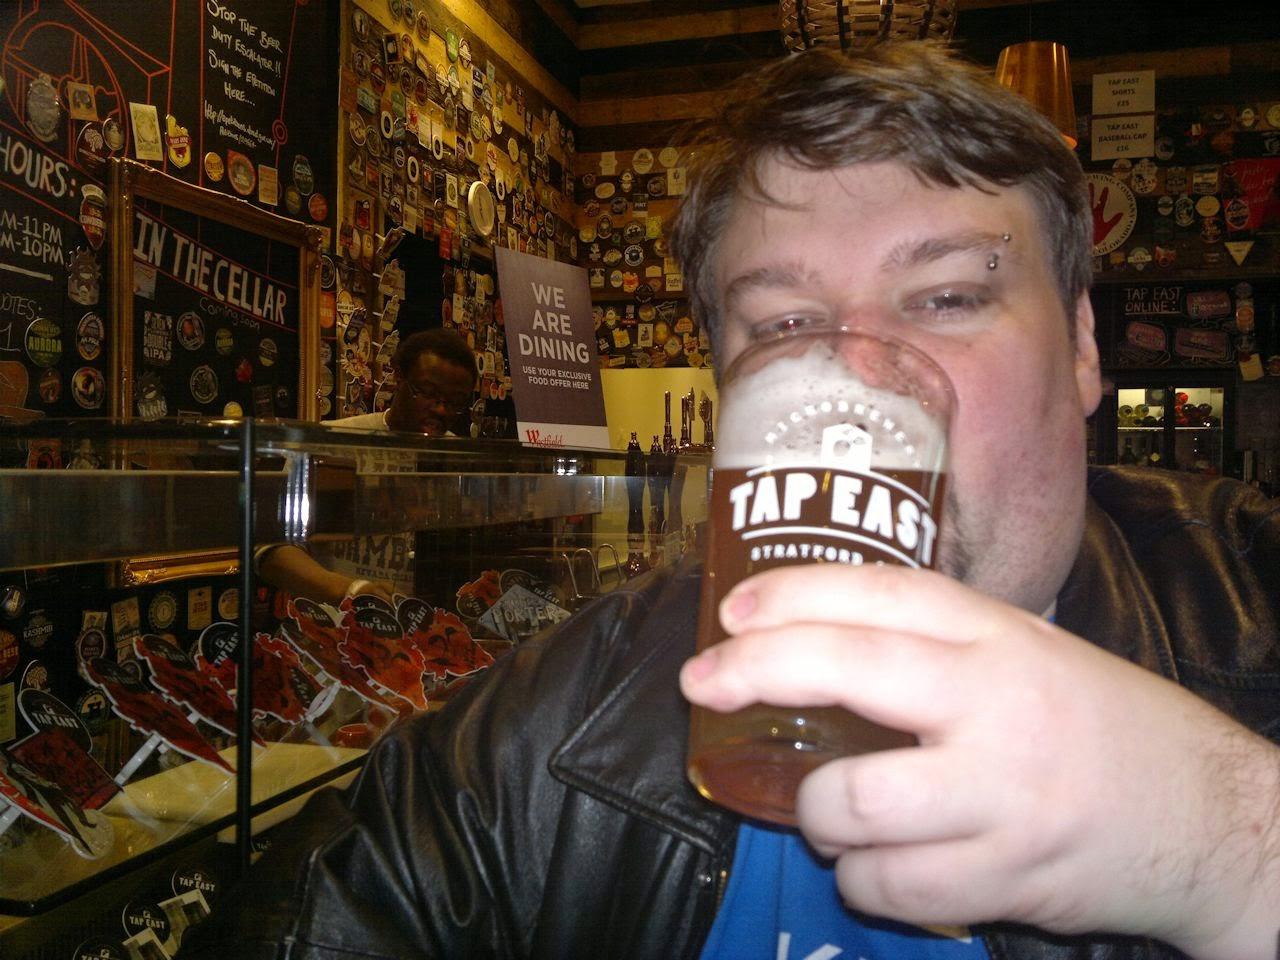 Ben drinking in Tap East